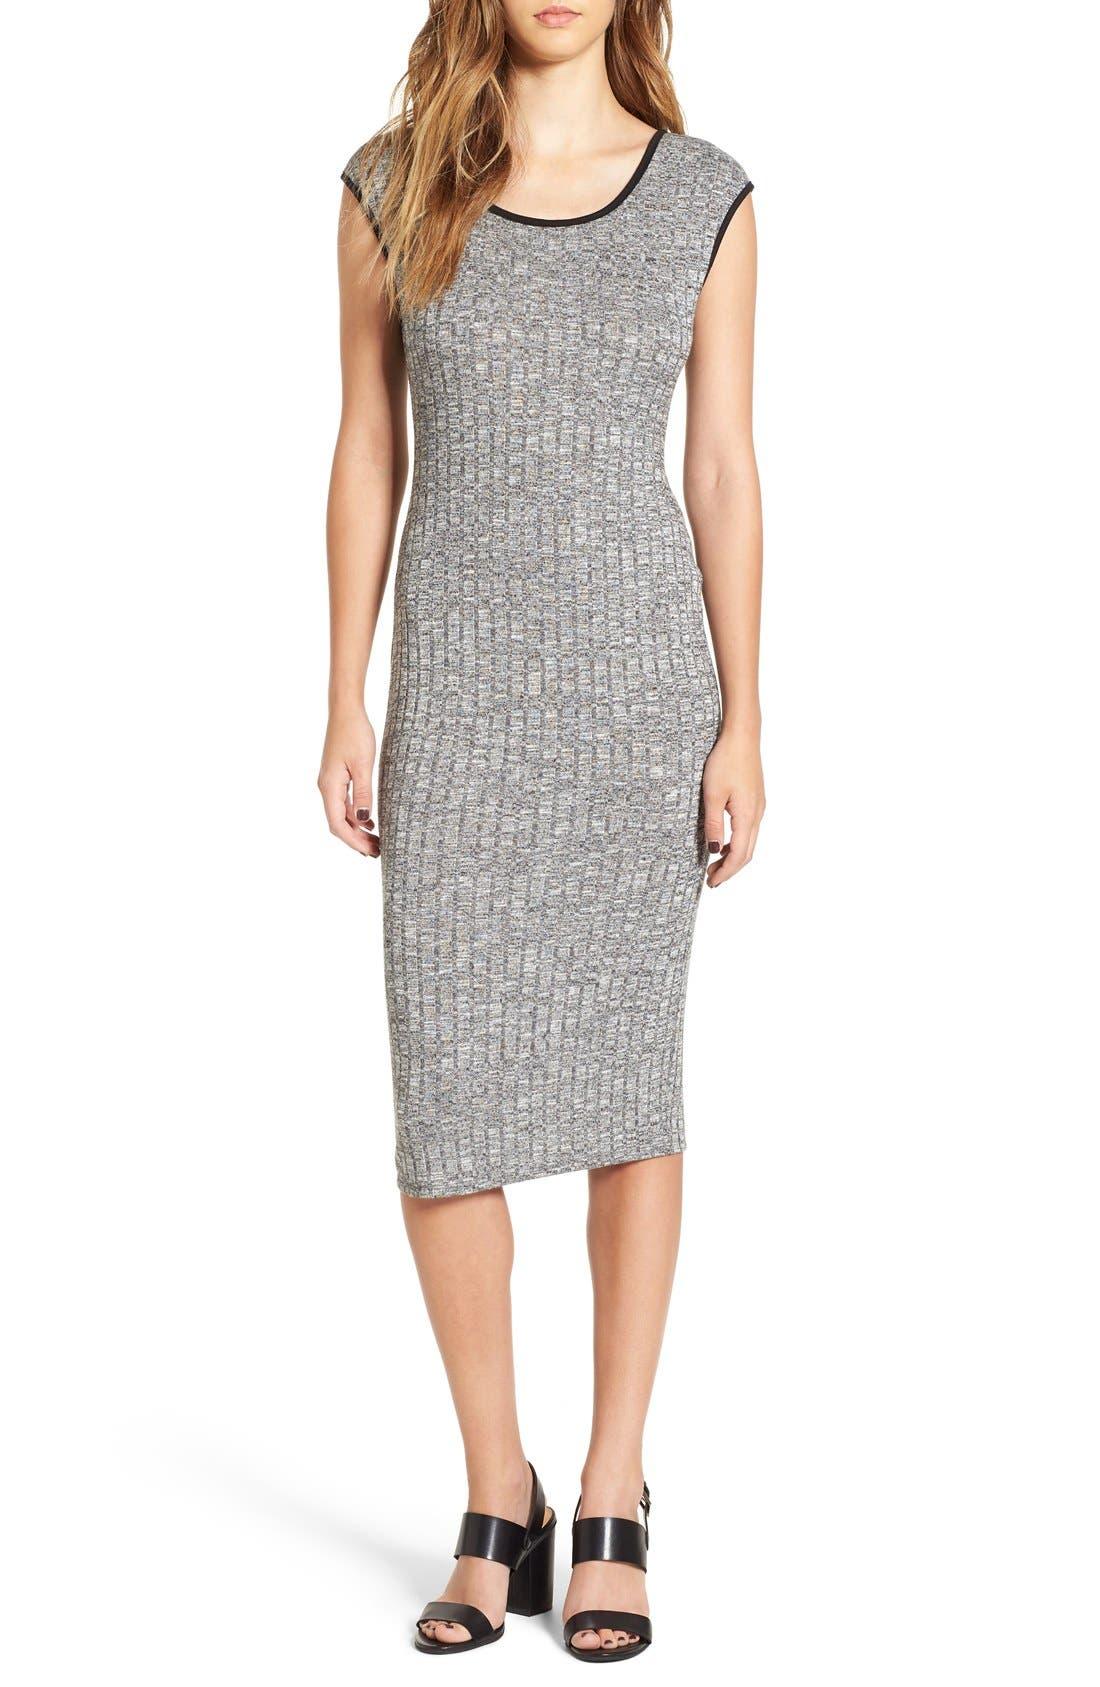 Alternate Image 1 Selected - Love Squared Rib Knit Midi Dress